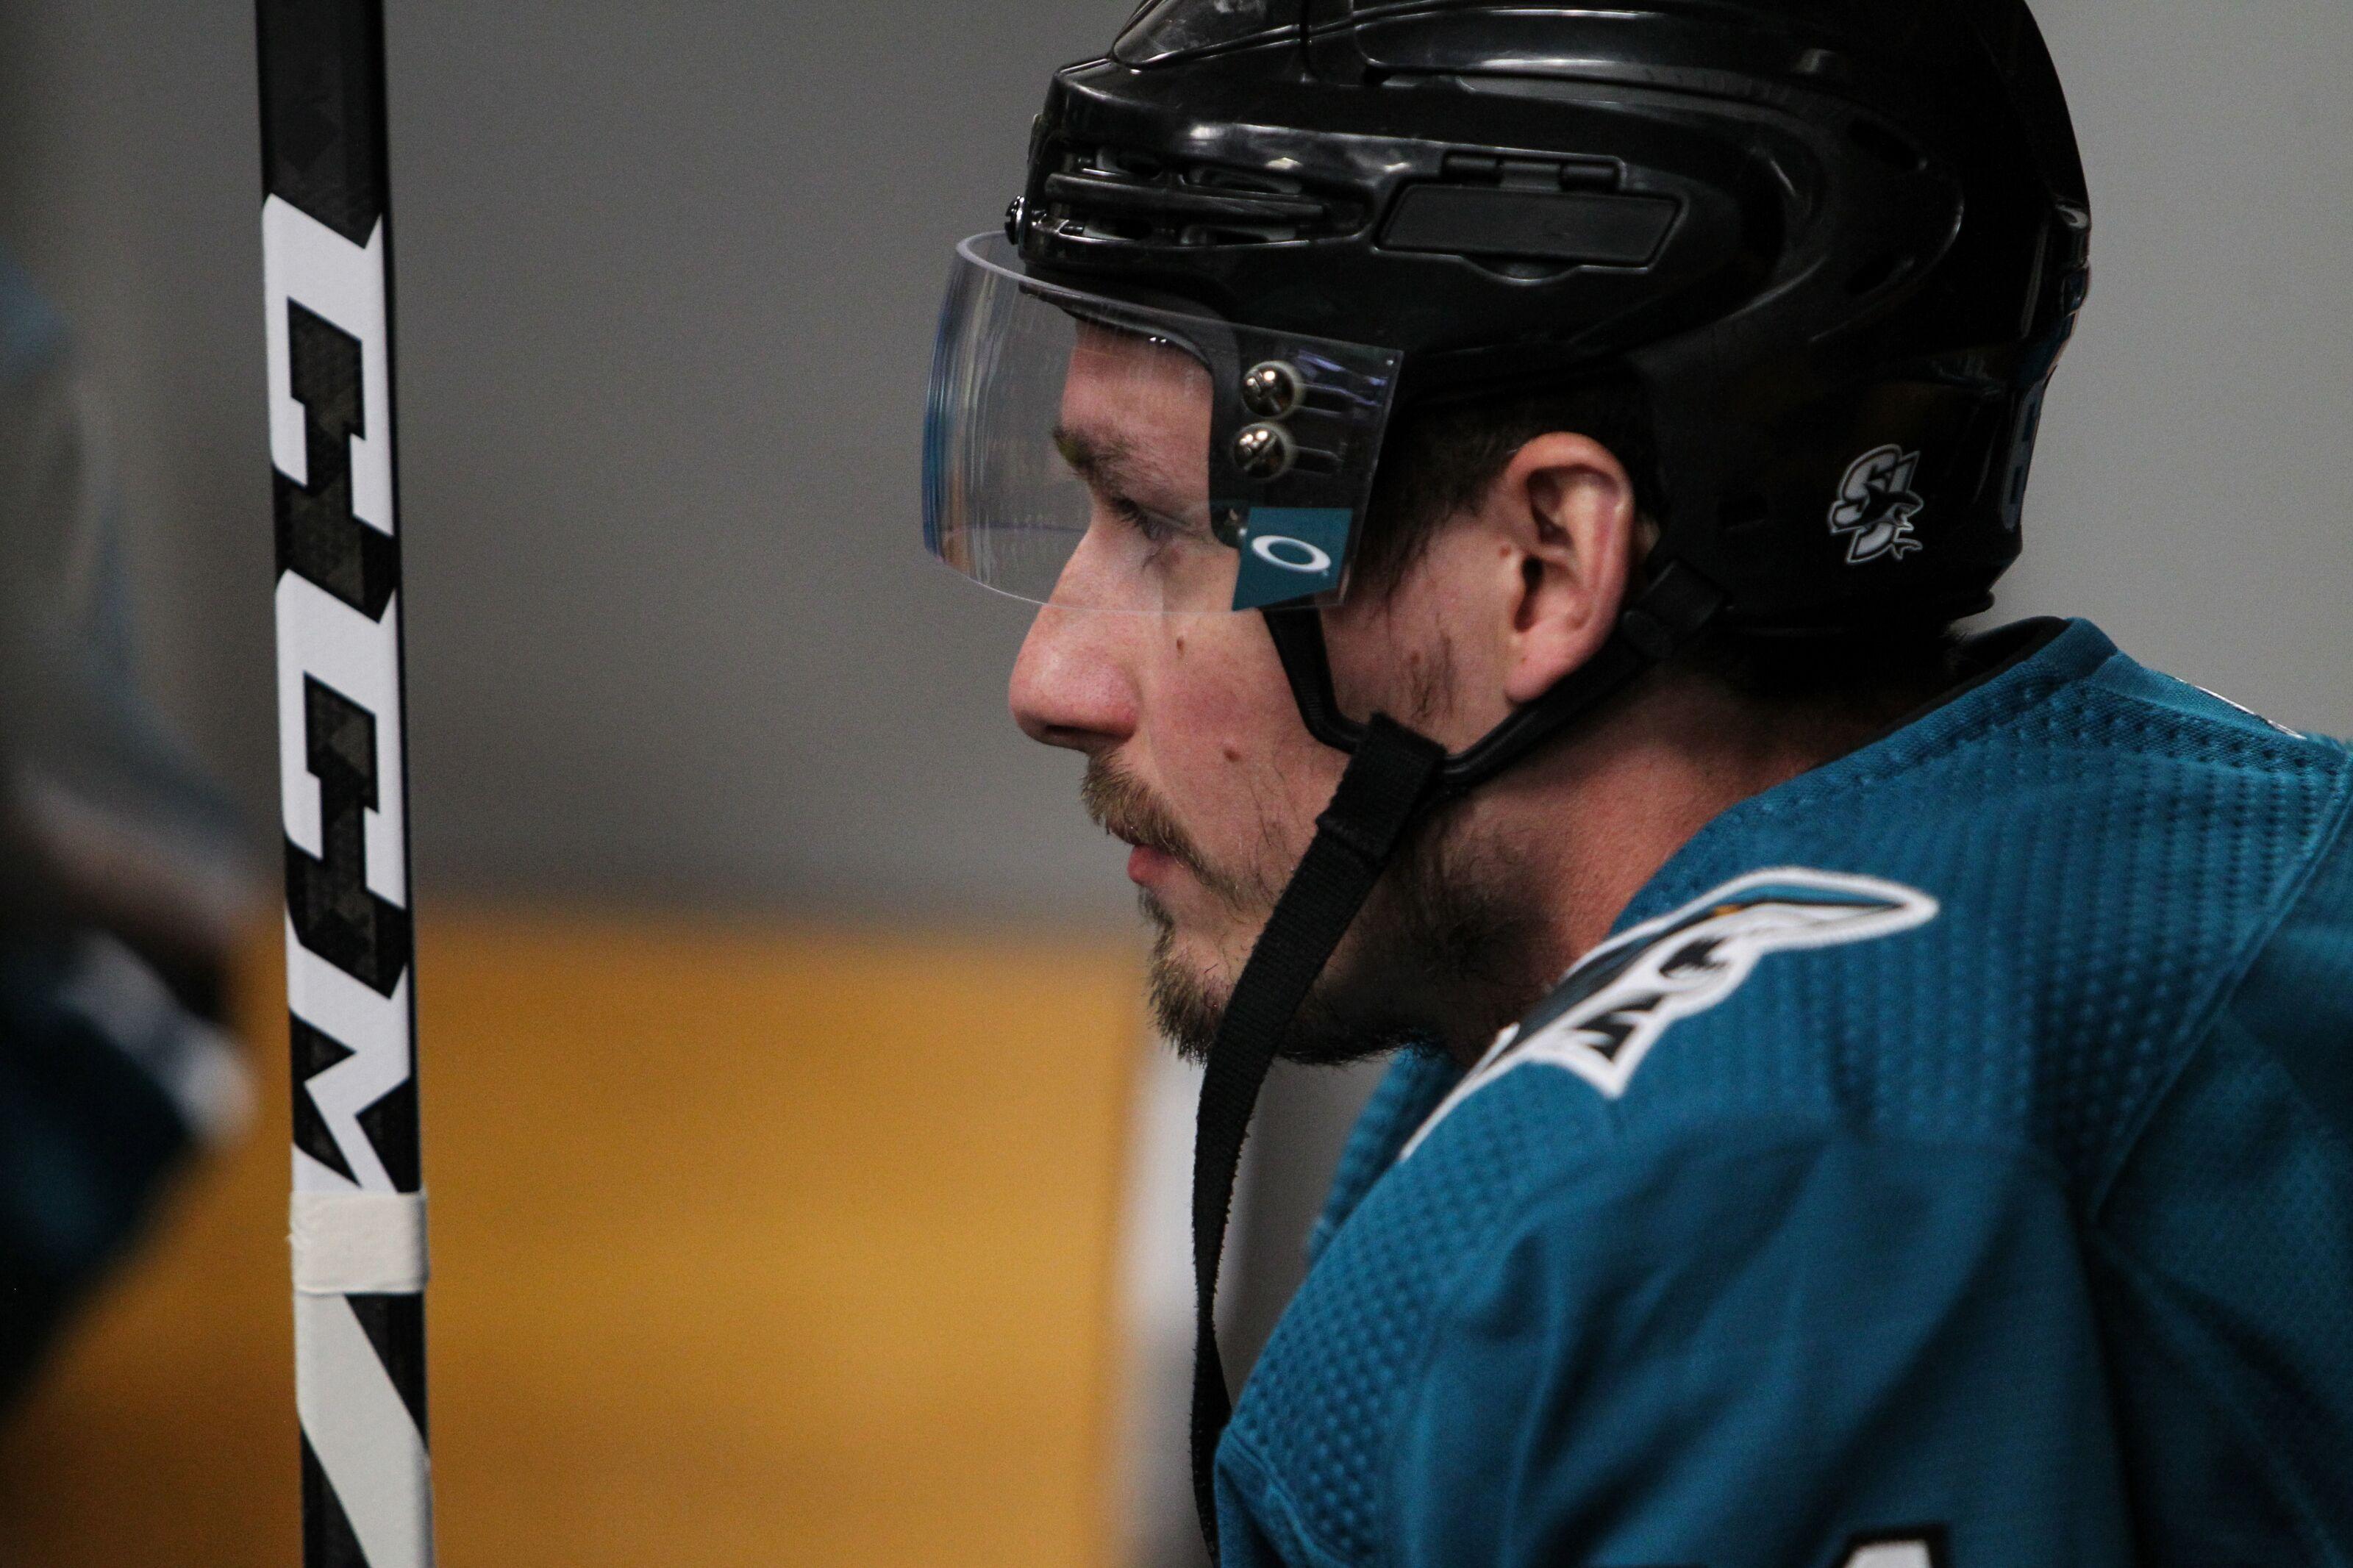 eae740324f7 San Jose Sharks Trade Justin Braun to Flyers for Draft Picks